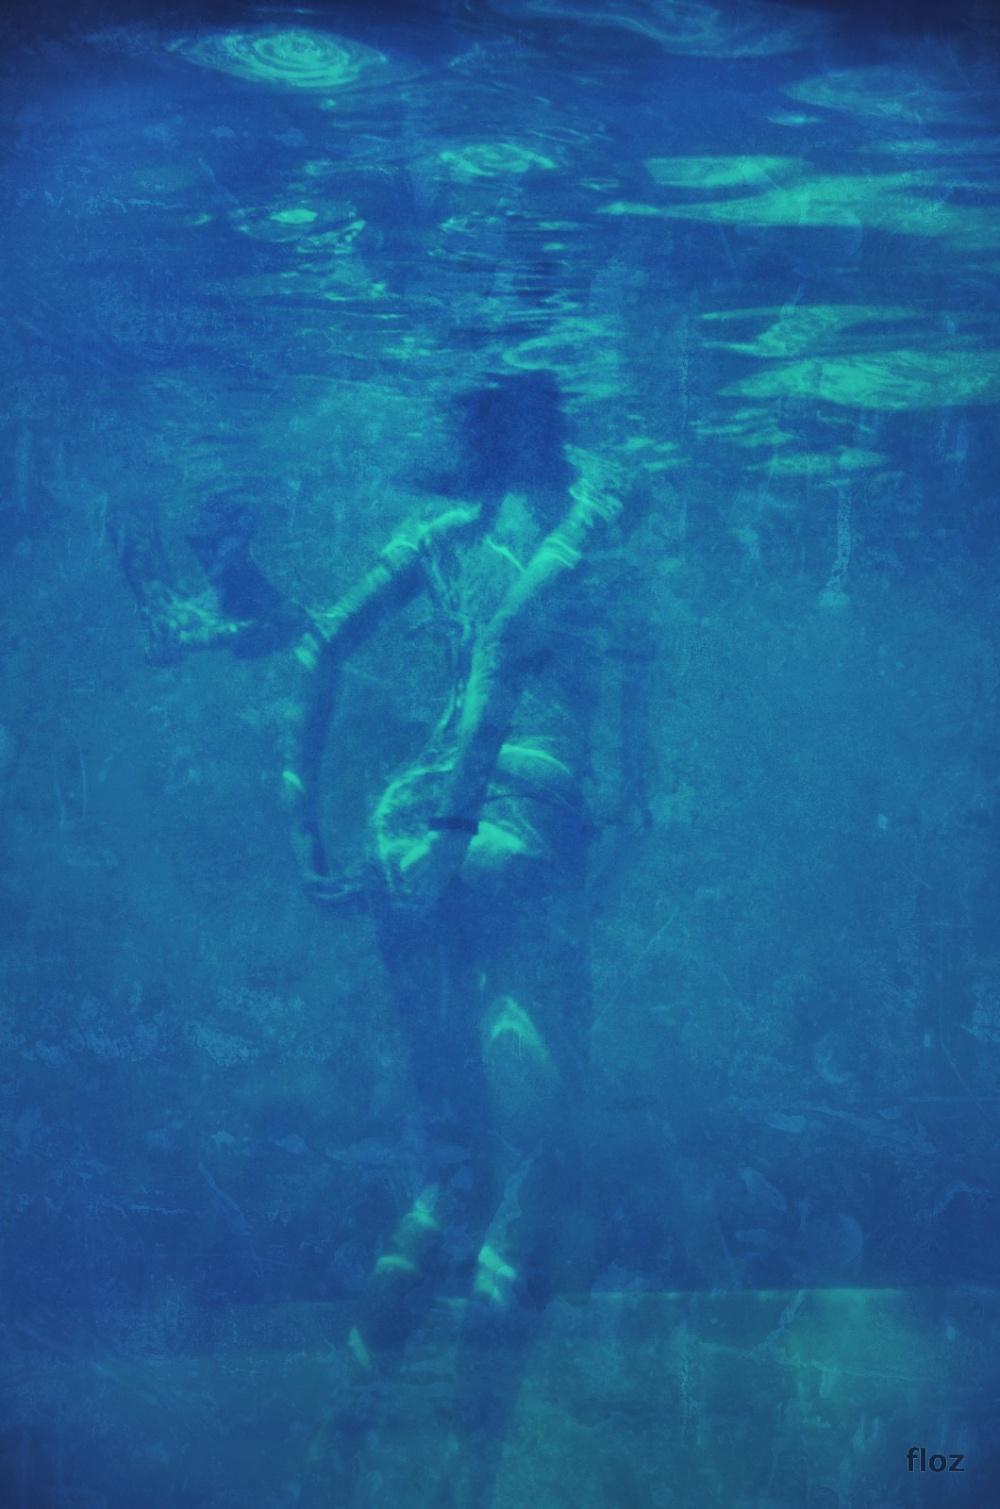 Au Fond De La Piscine : piscine, 22AAAA, (#2AA), Image, Color, Scheme